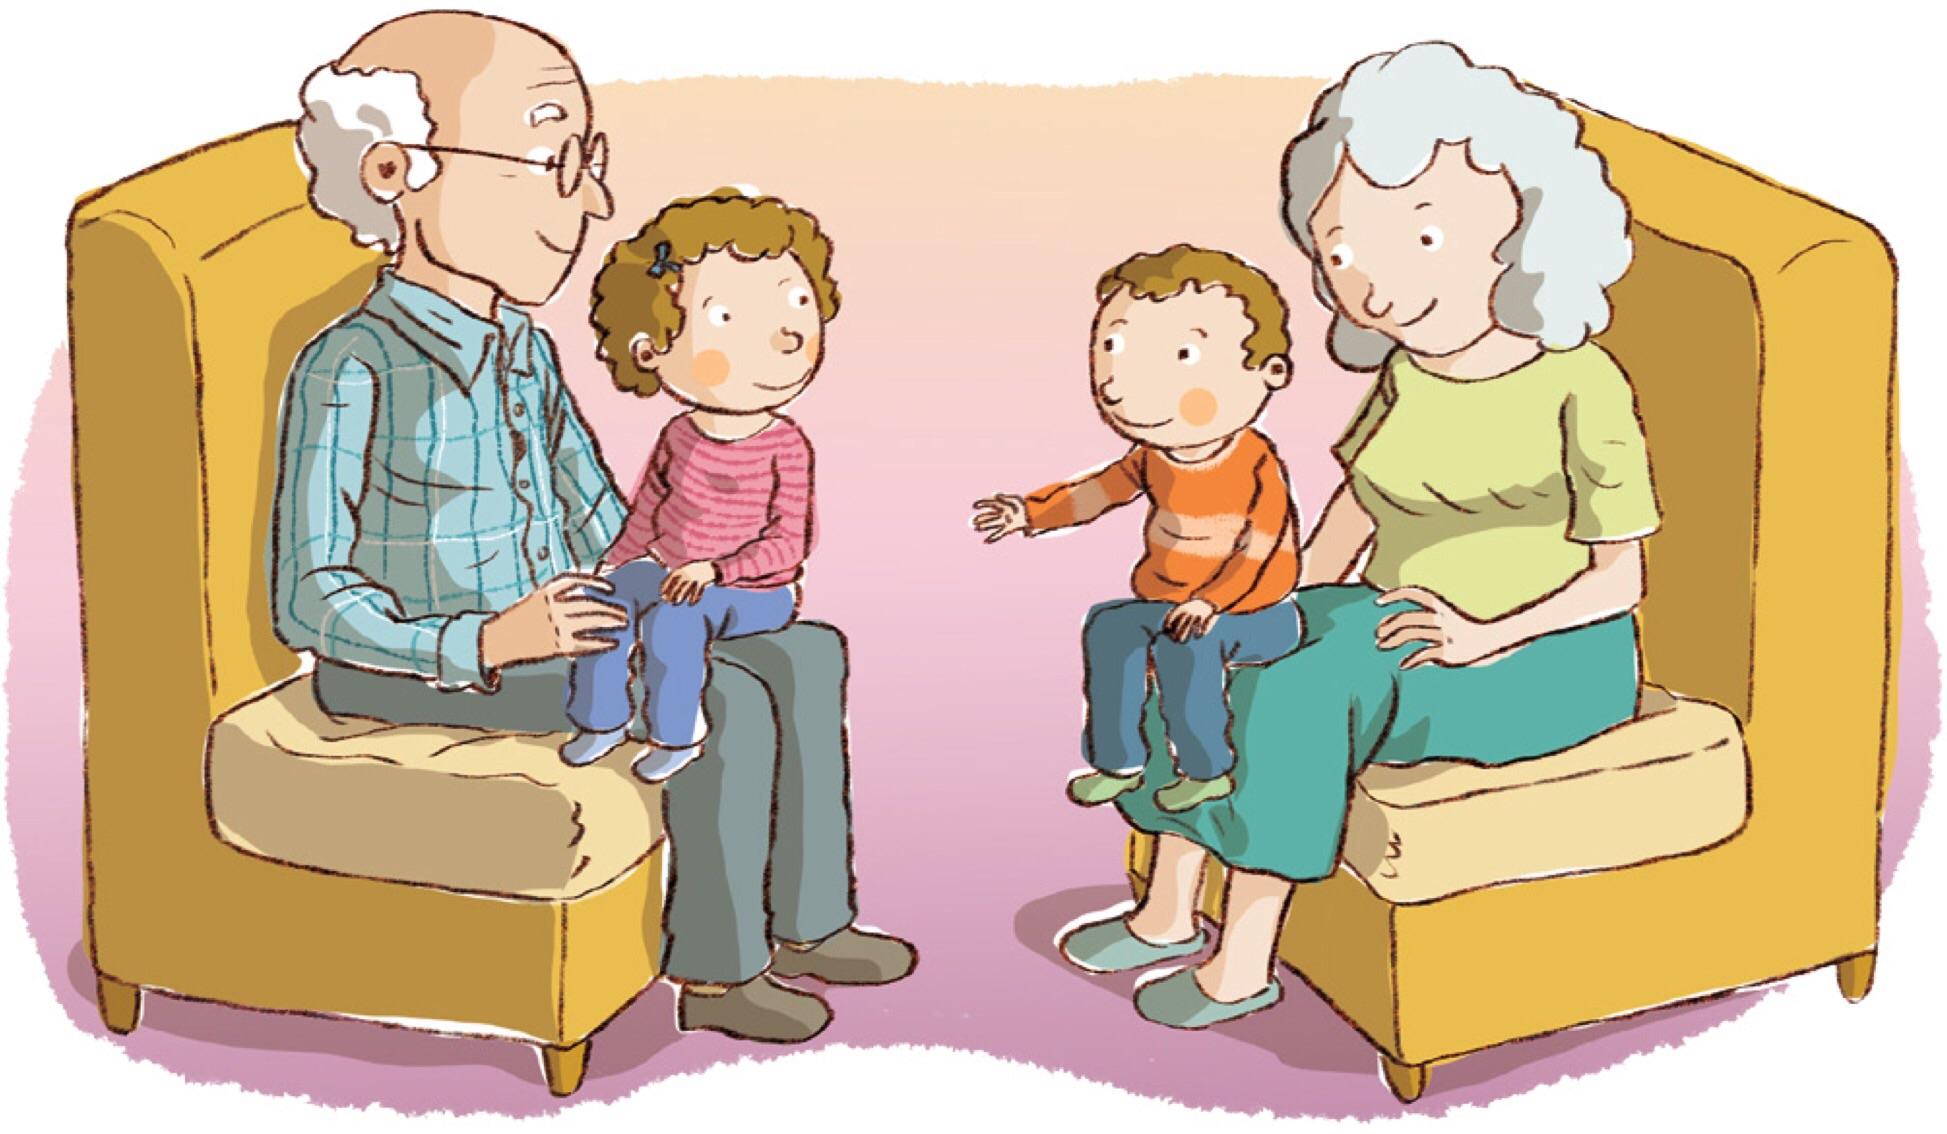 grandparent clipart image . - Grandparents Clip Art